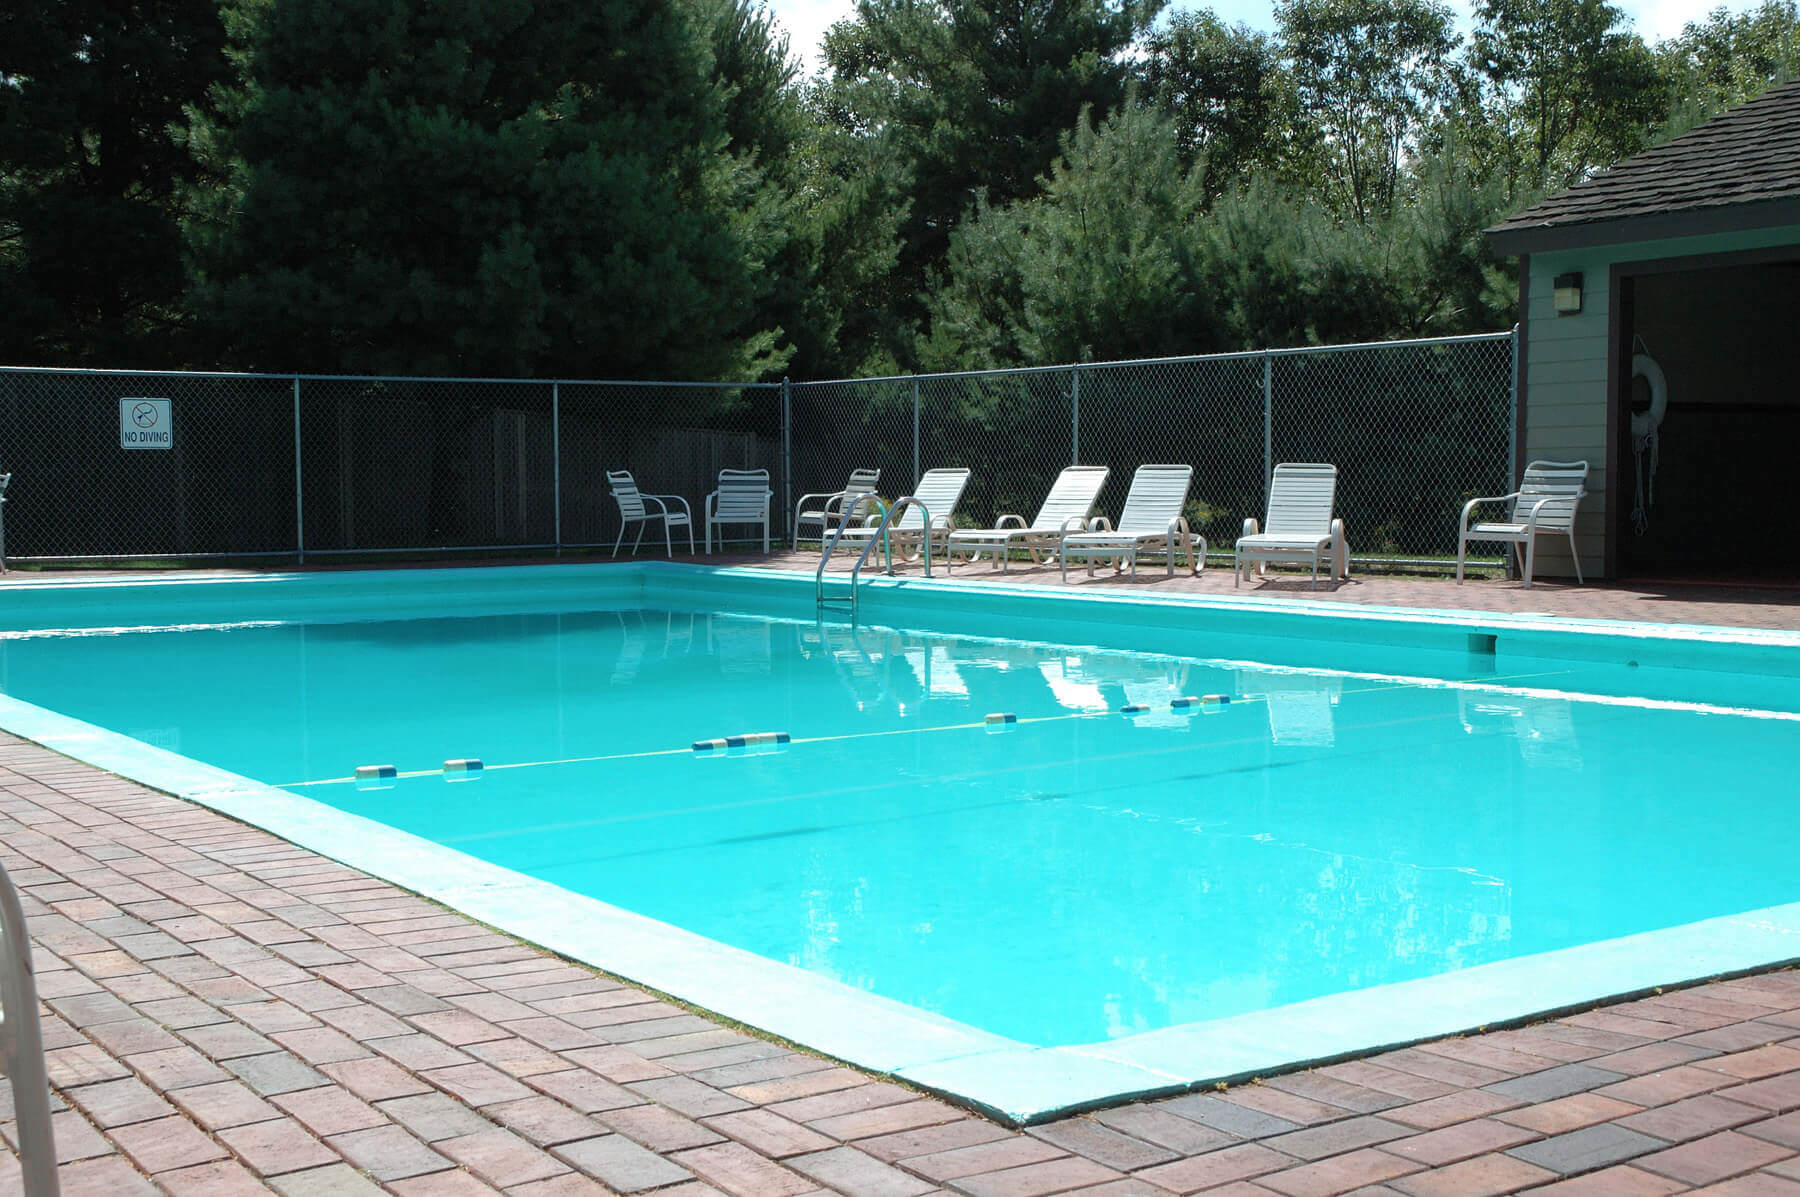 Tipos de bombas para piscina acerte na hora de escolher - Tipo de piscinas ...